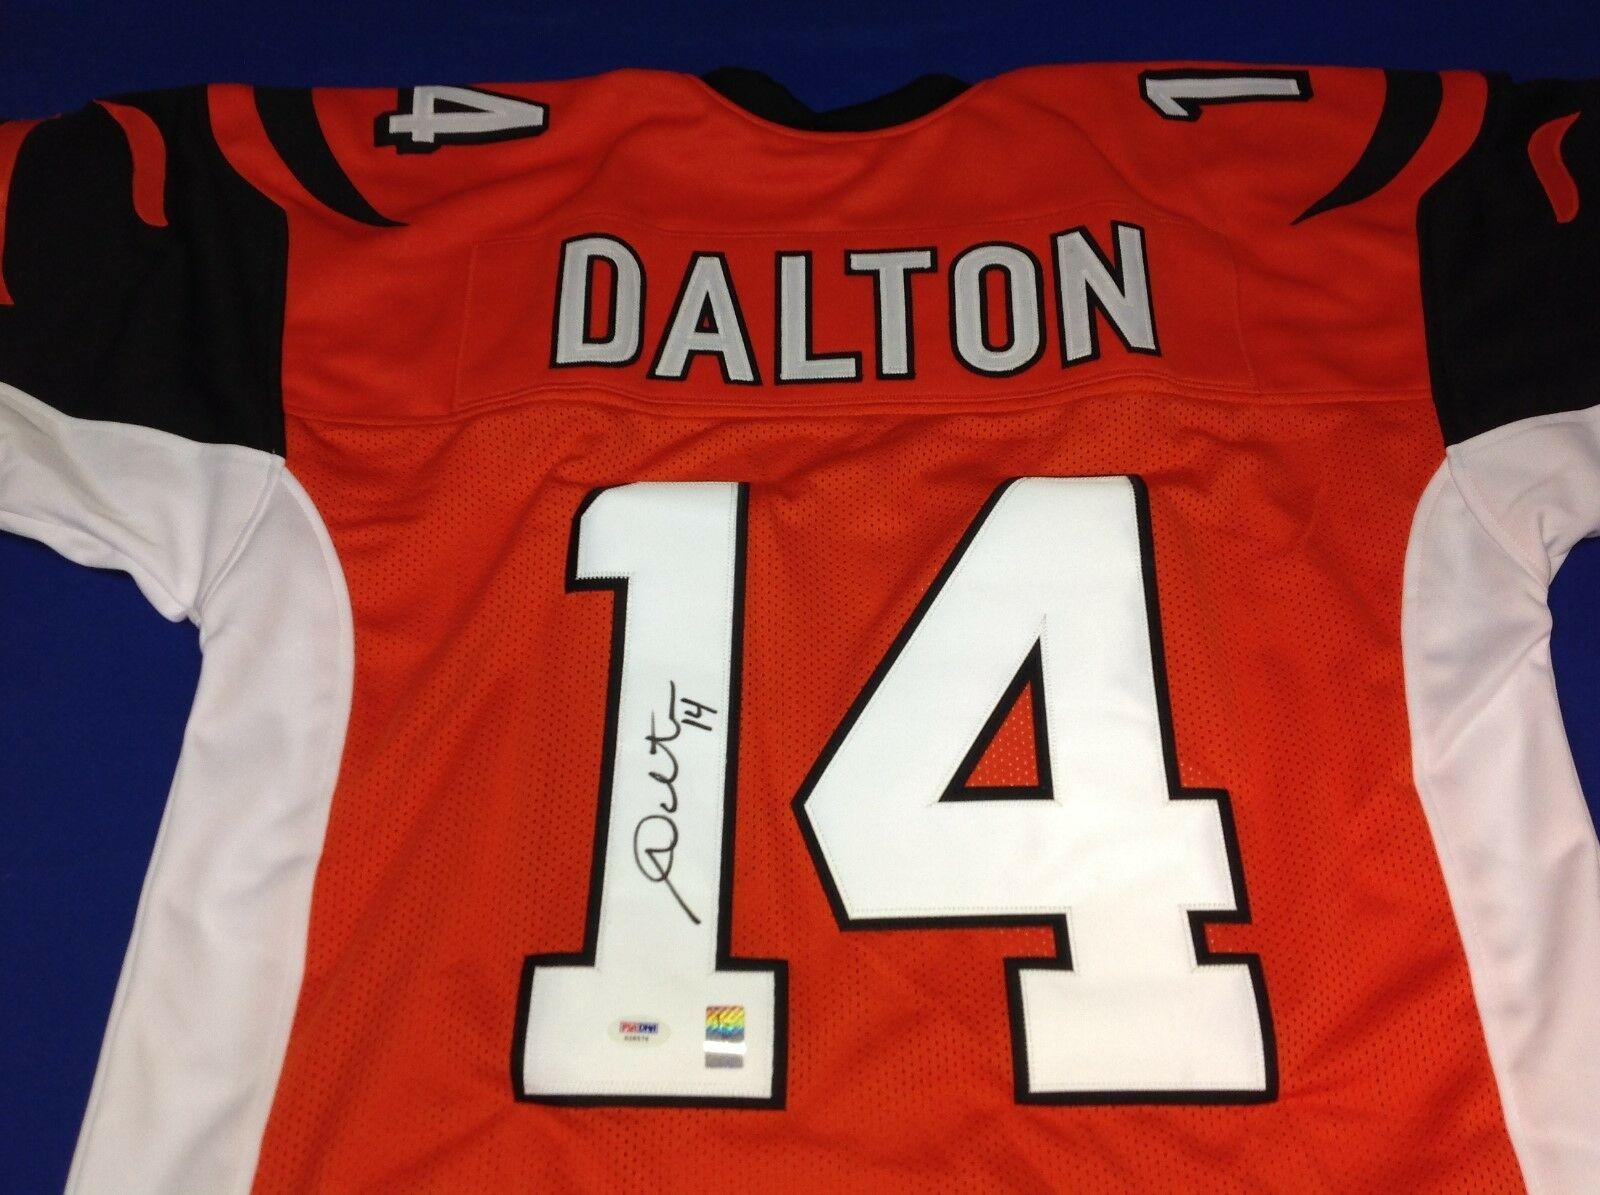 Andy Dalton Signed Cincinnati Bengals Football Jersey PSA/DNA X28576